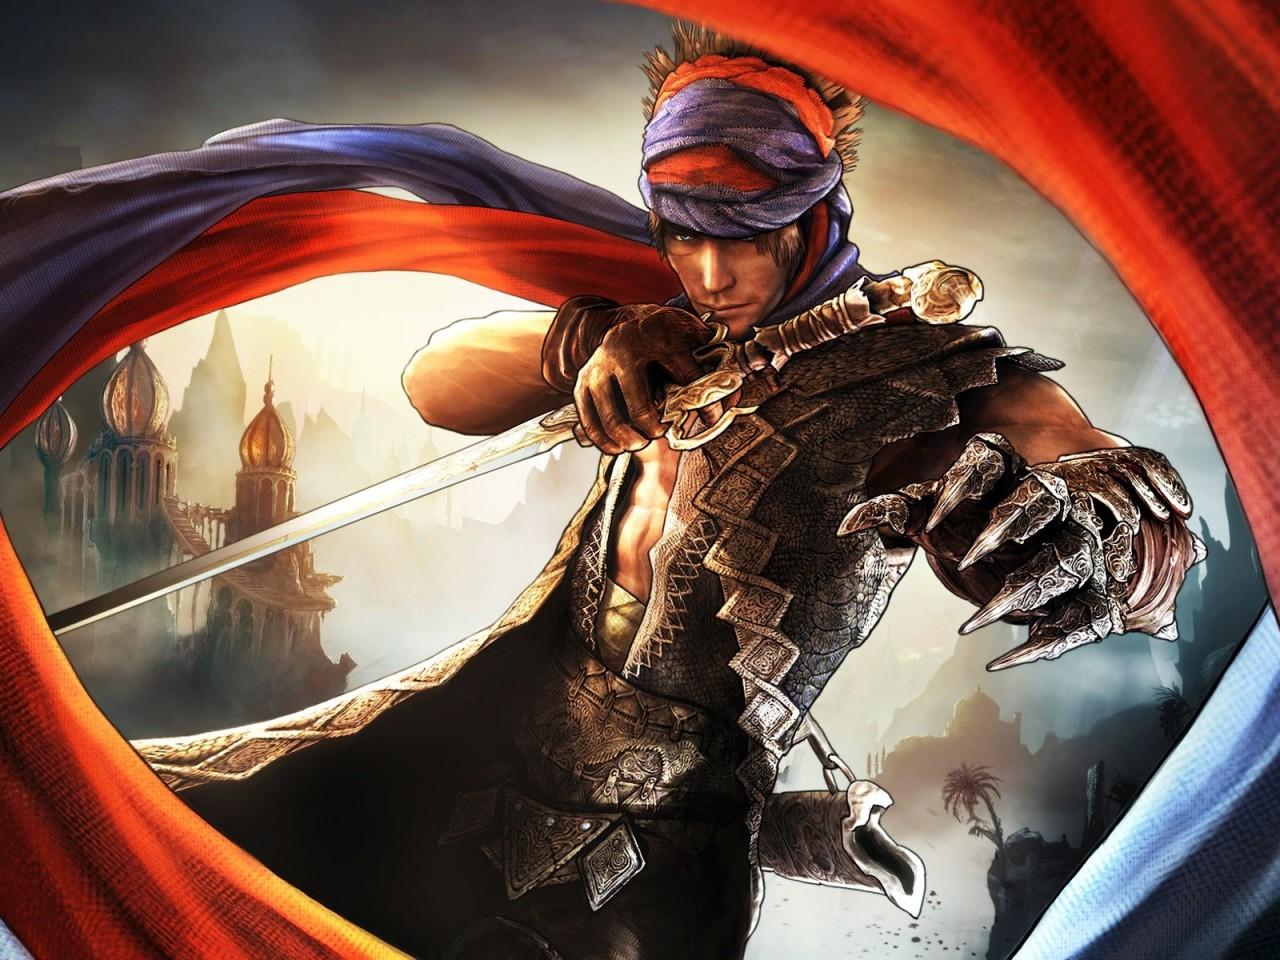 Hd Game Wallpaper Widescreen Prince Of Persia Game Wallpapers Hd Wallpapers Id 9047